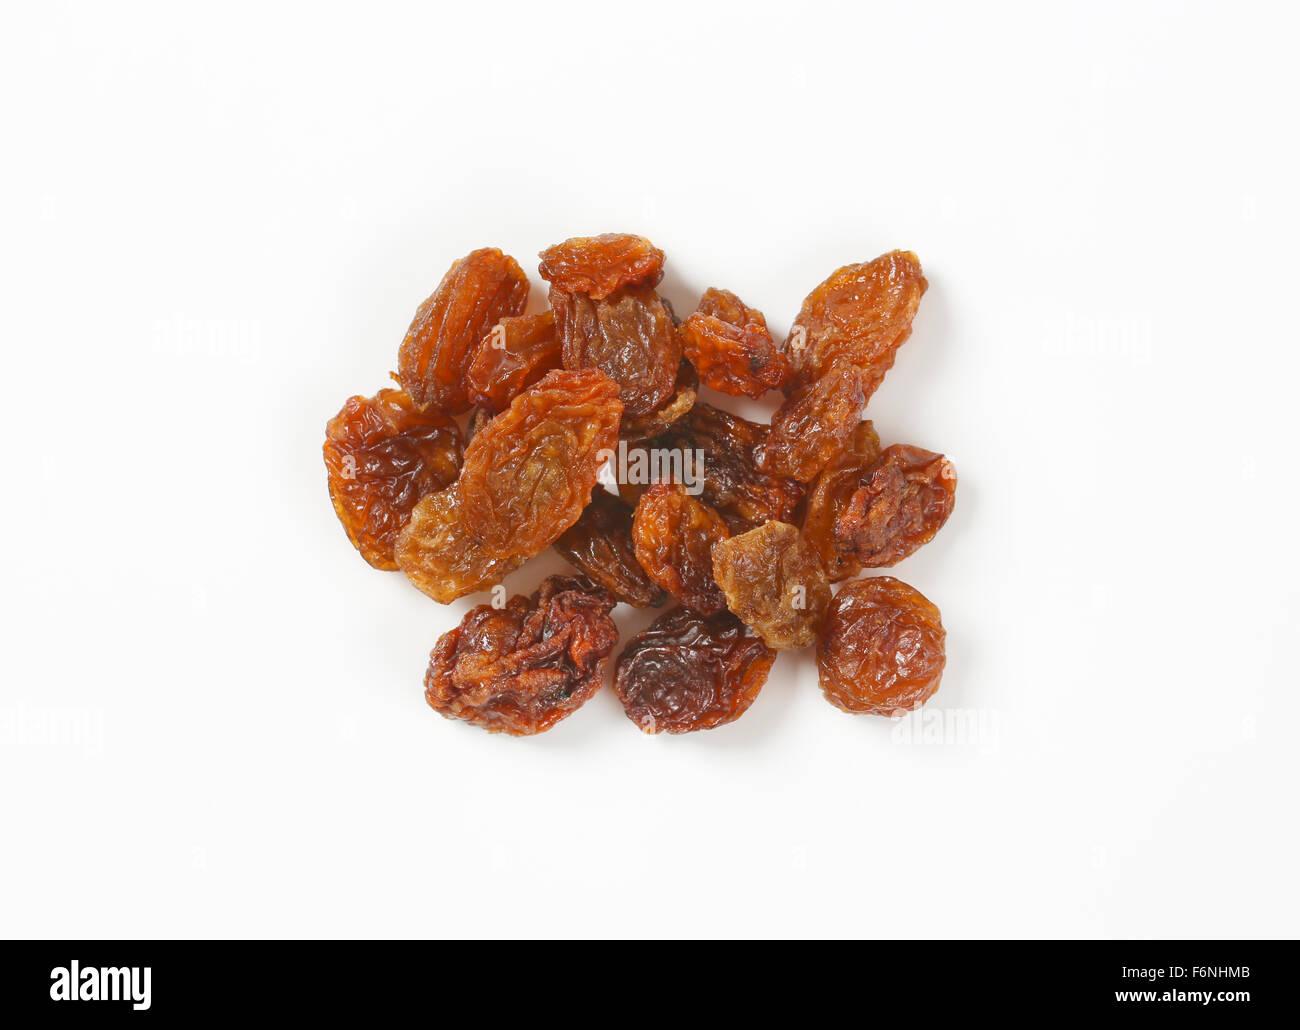 handful of raisins on white background - Stock Image